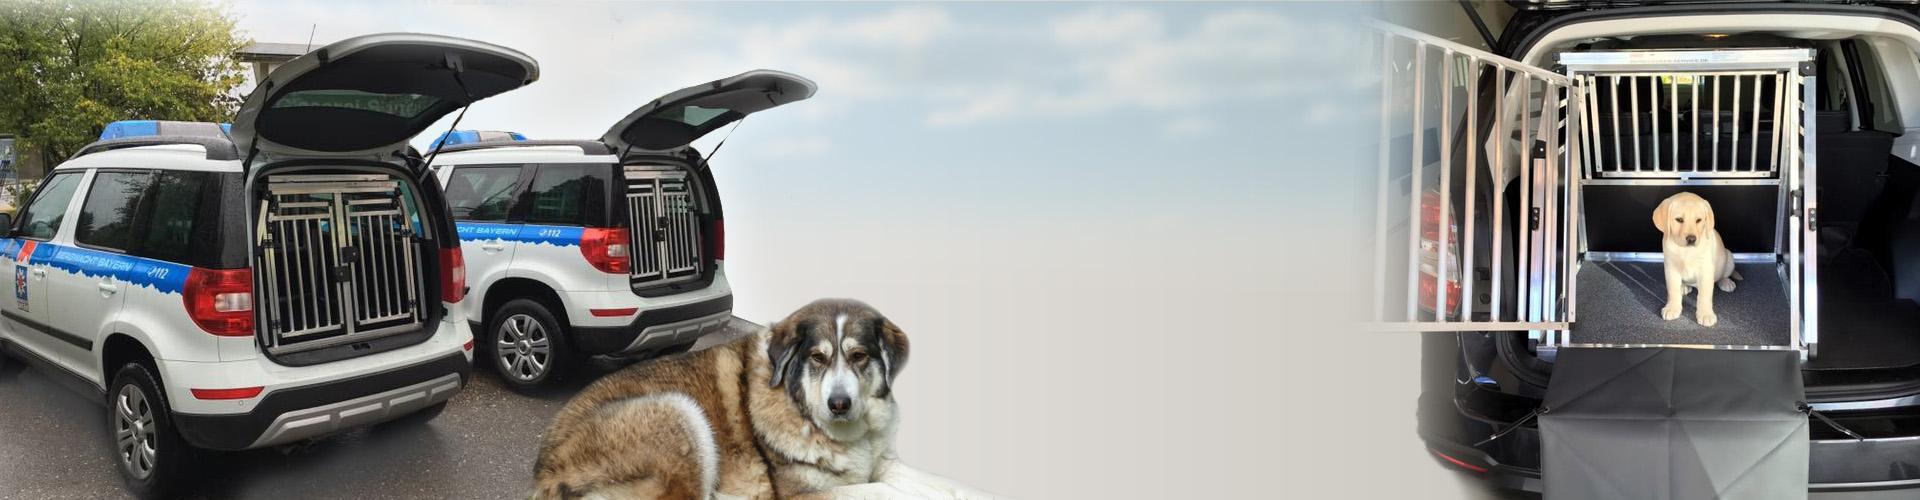 hundeboxen bucher hundeboxen hundebetten und hundegitter nach ma. Black Bedroom Furniture Sets. Home Design Ideas